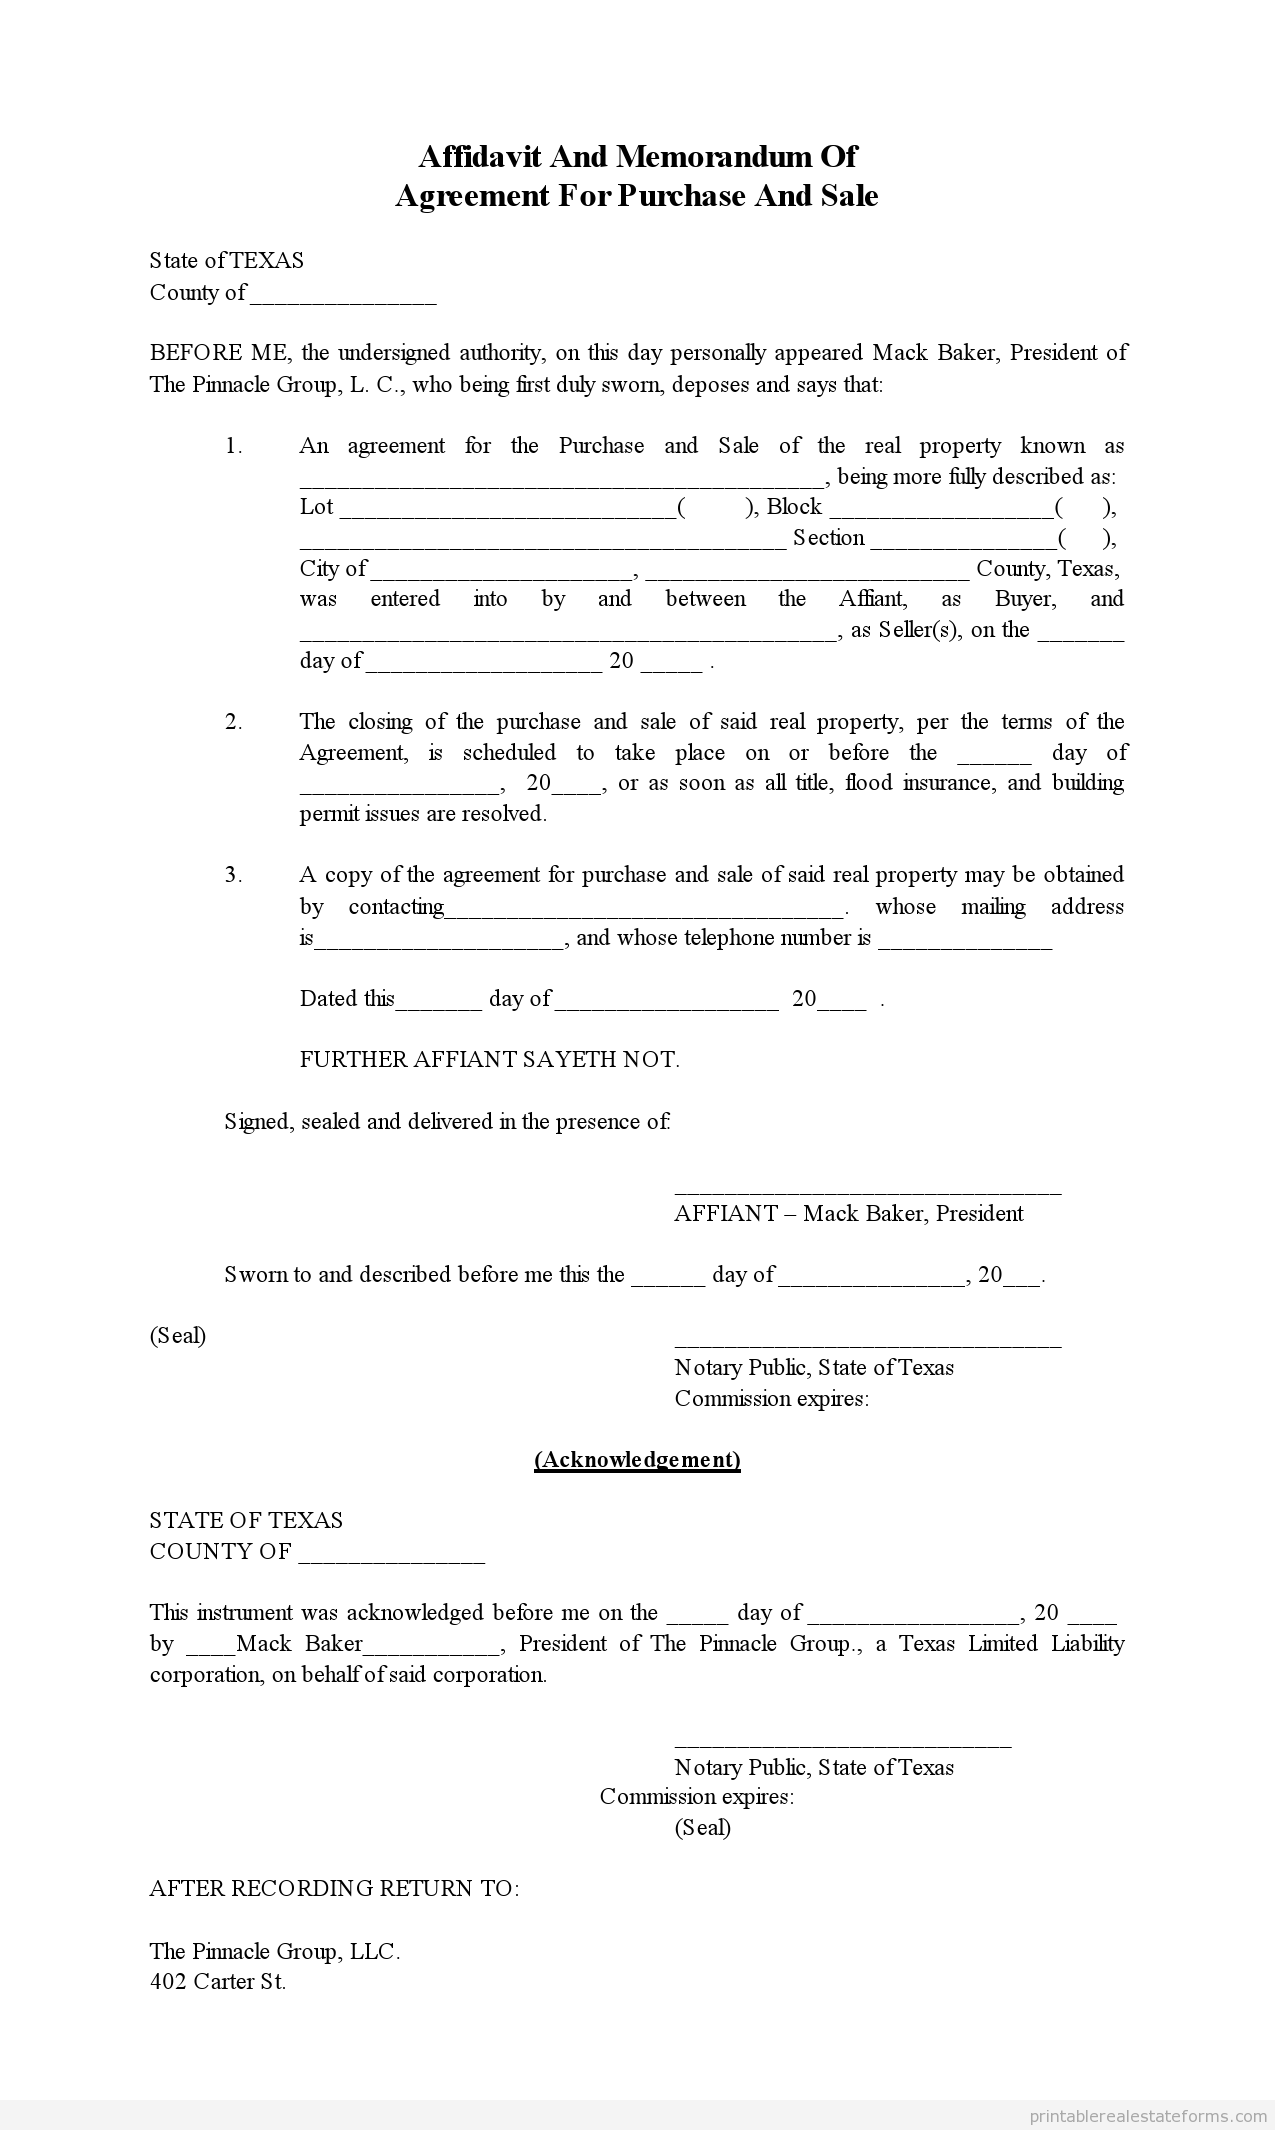 Sample Printable affidavit of memorandum for purchase and ...